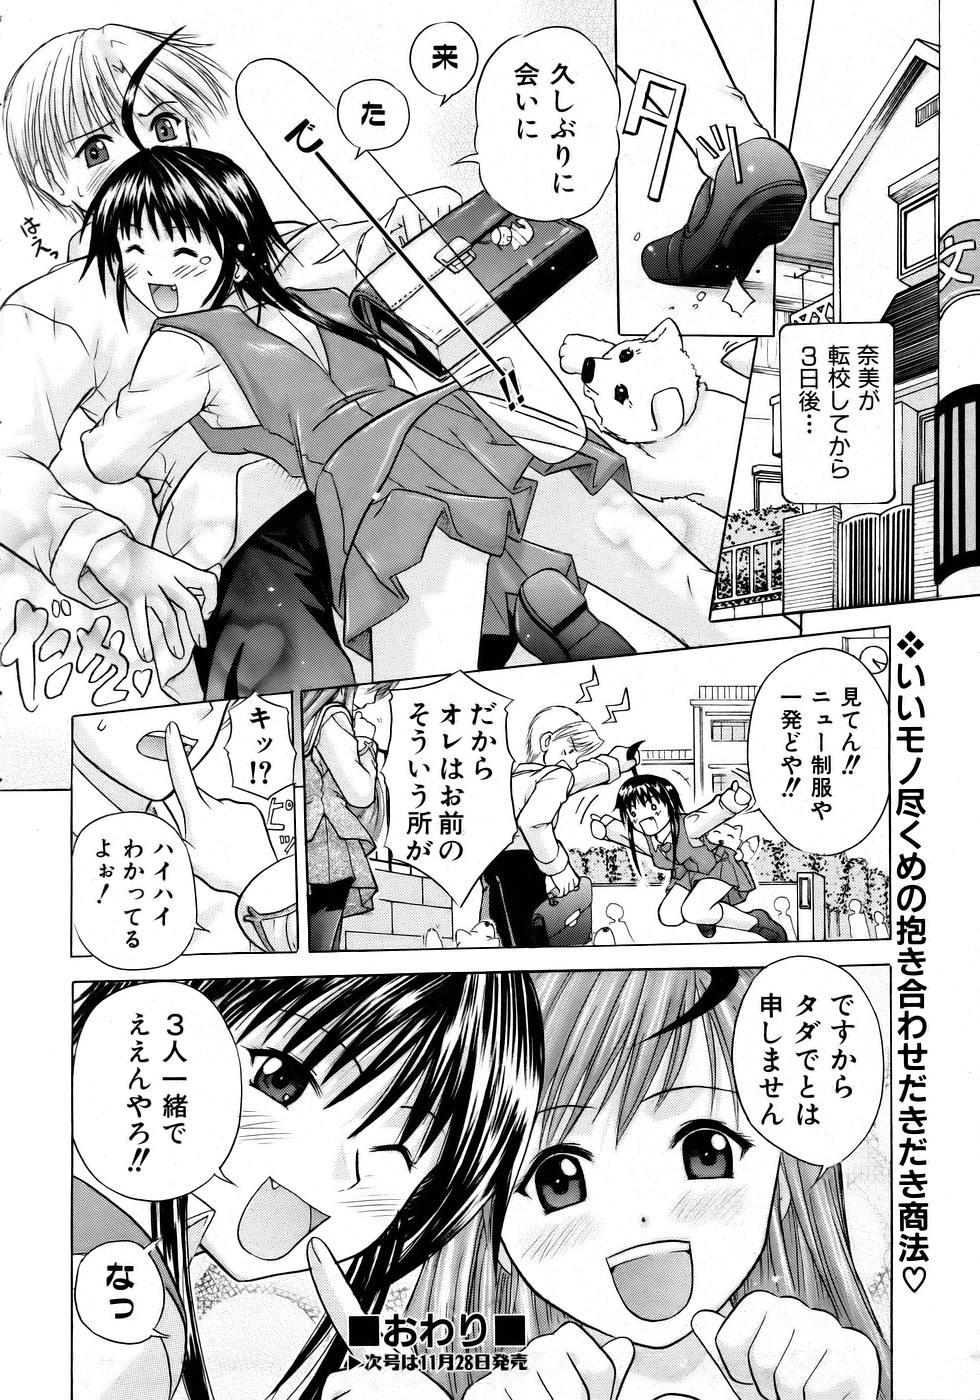 COMIC AUN 2005-12 Vol. 115 305